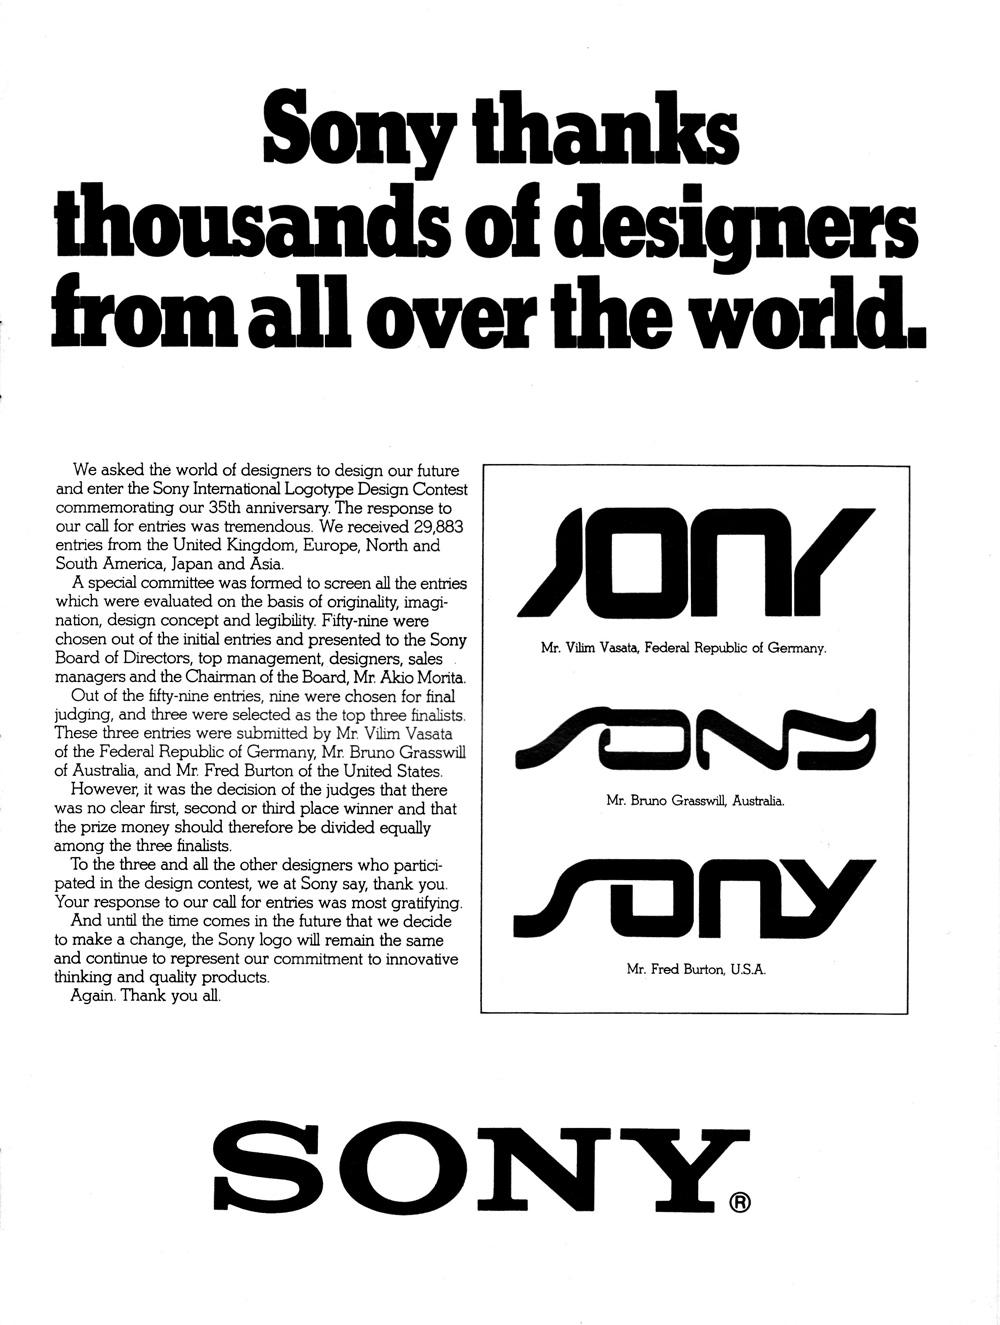 Entwürfe von Sony-Logos 1981 (Bild: Time Magazine)